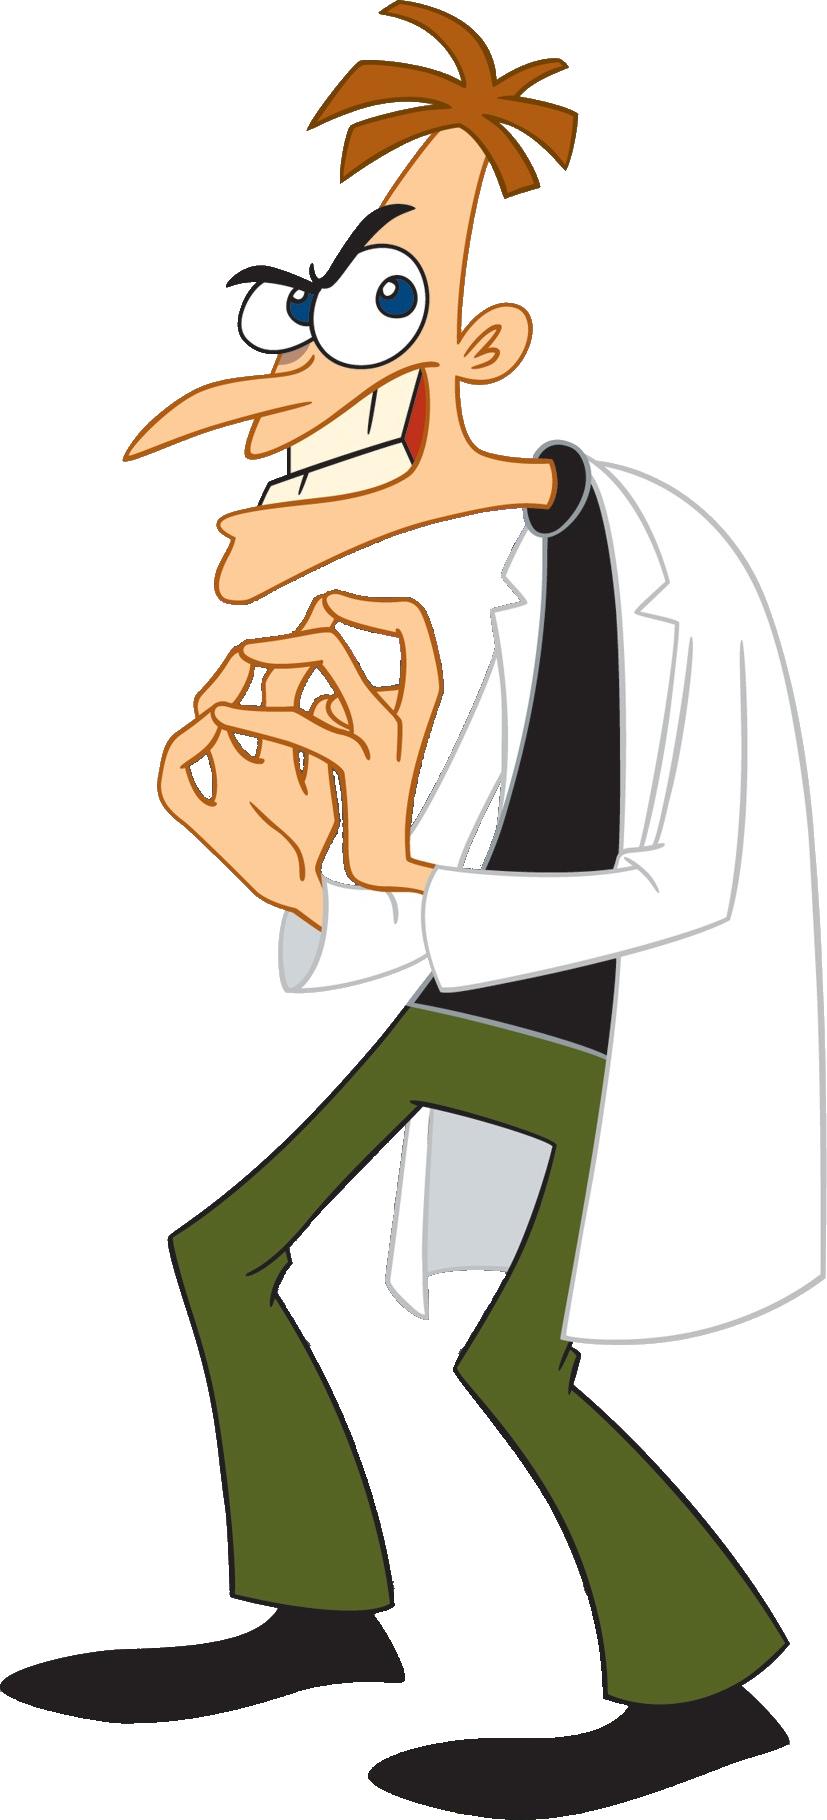 Phineas And Ferb Dr Doofenshmirtz Building DoofenshmirtzPn...